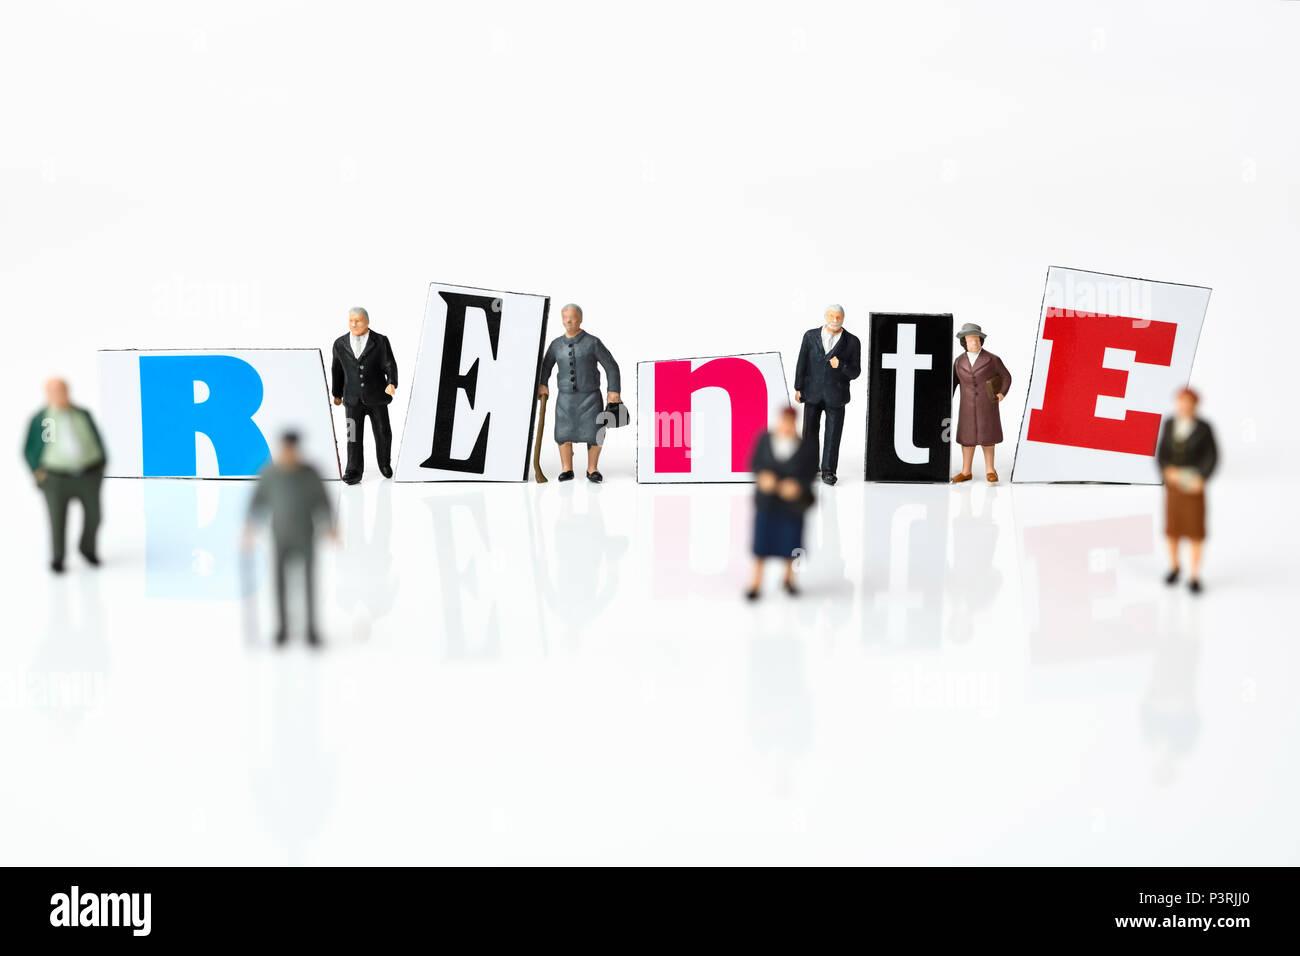 Pension miniature figures and lettering, Miniaturfiguren und Rente-Schriftzug Stock Photo